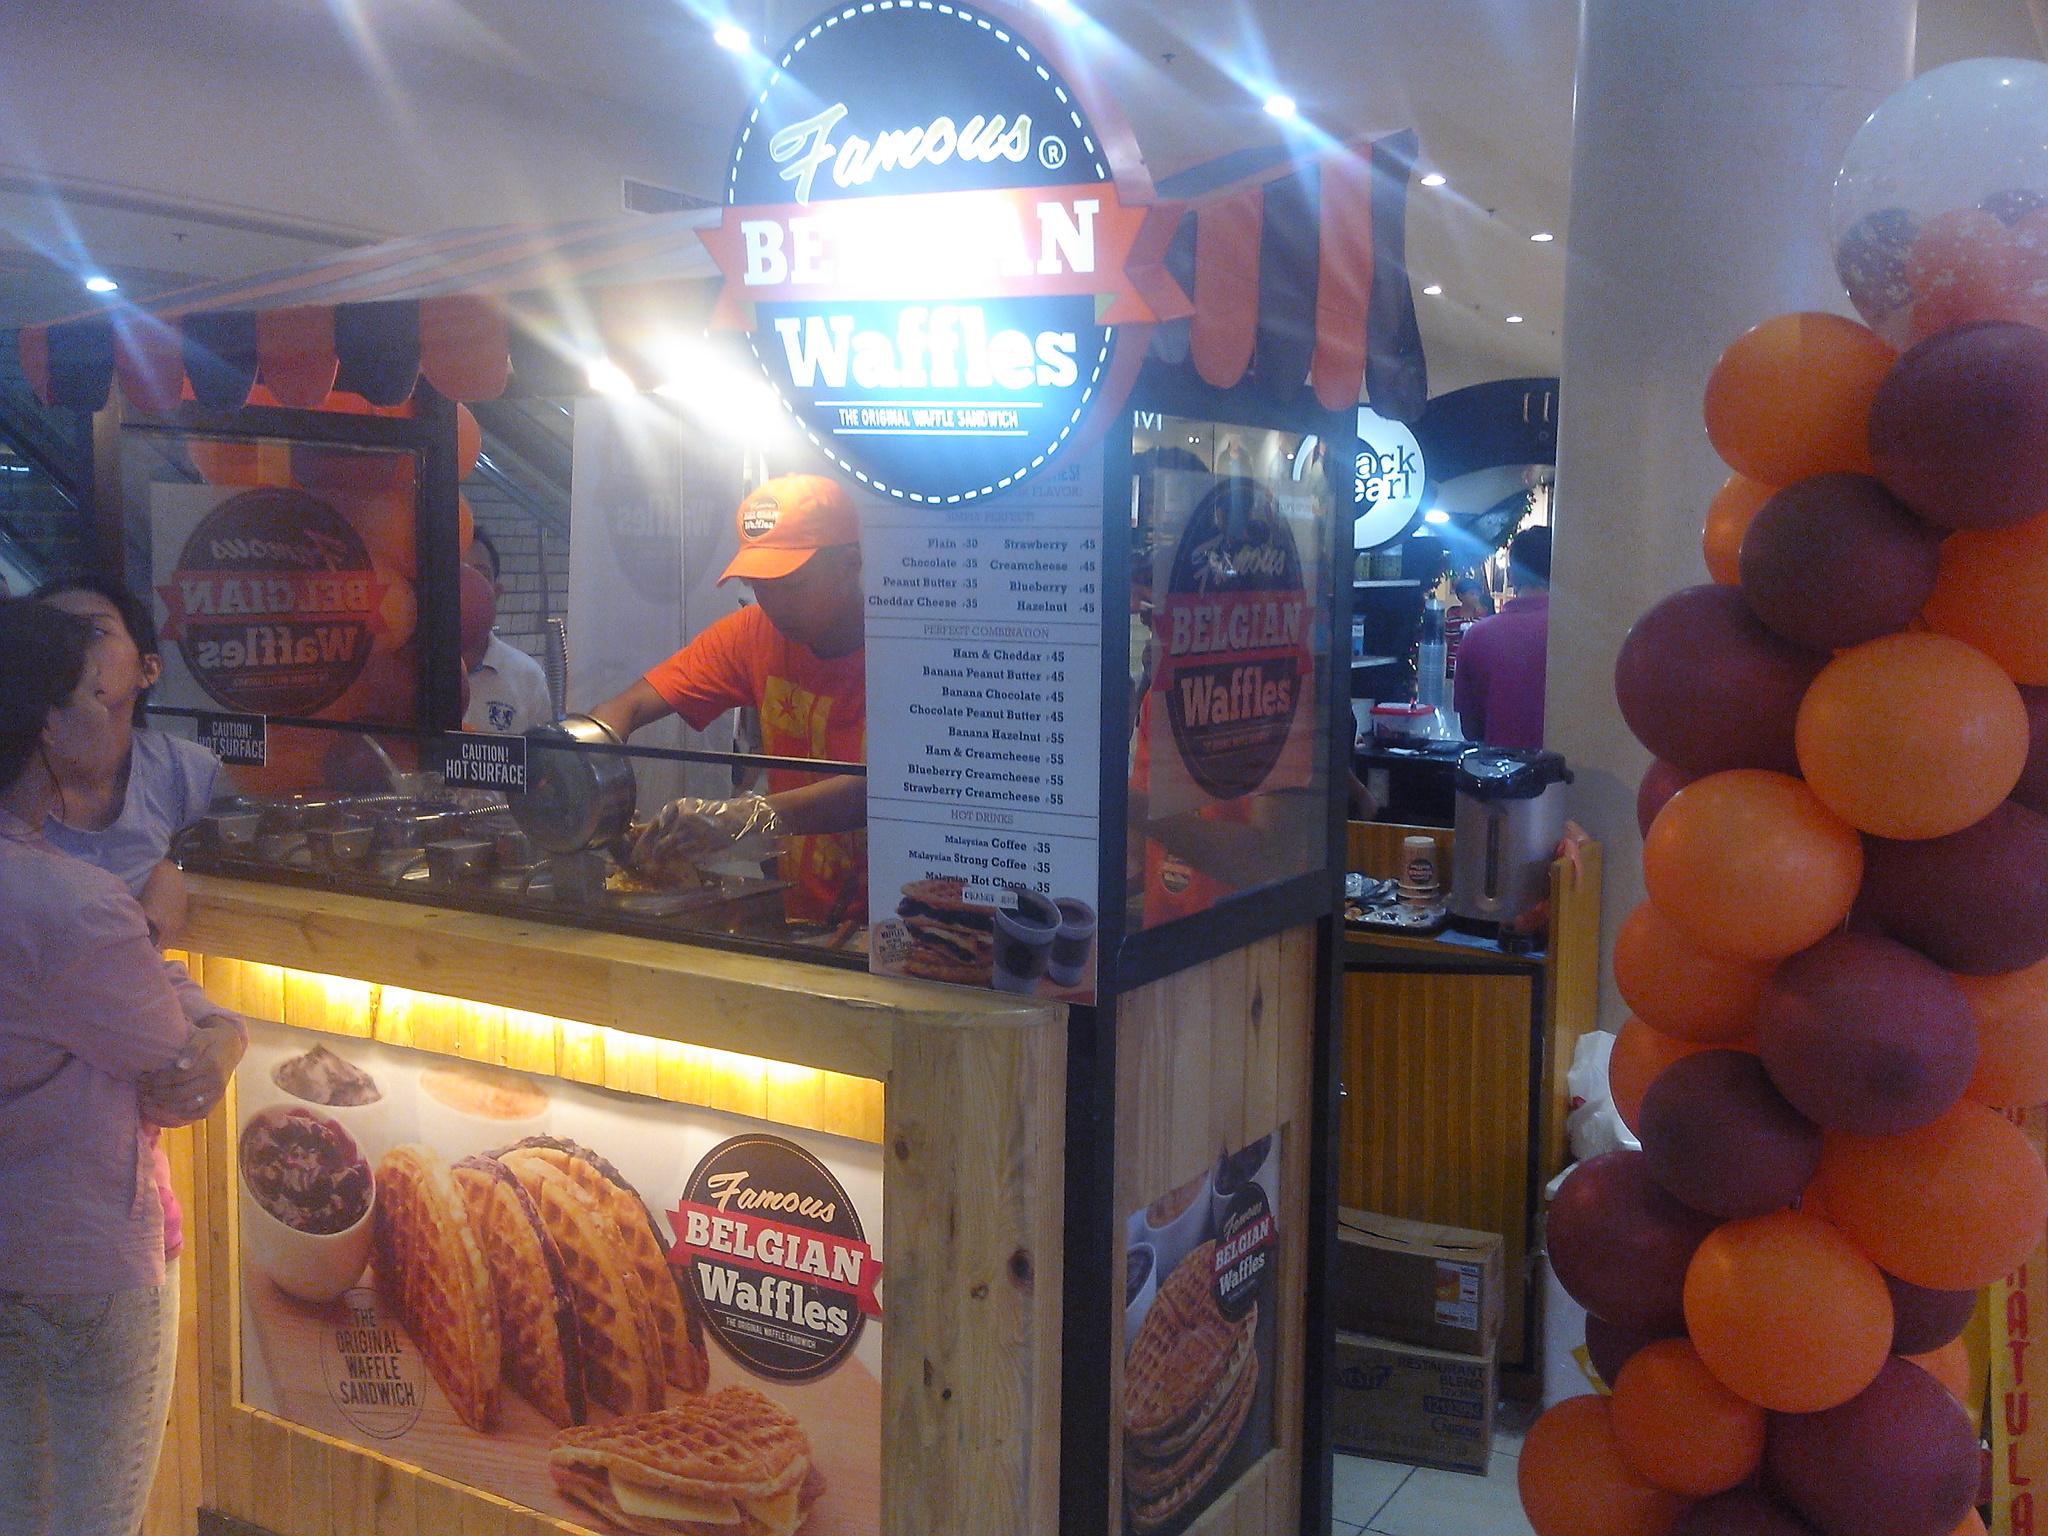 Foodspotting: Famous Belgian Waffles